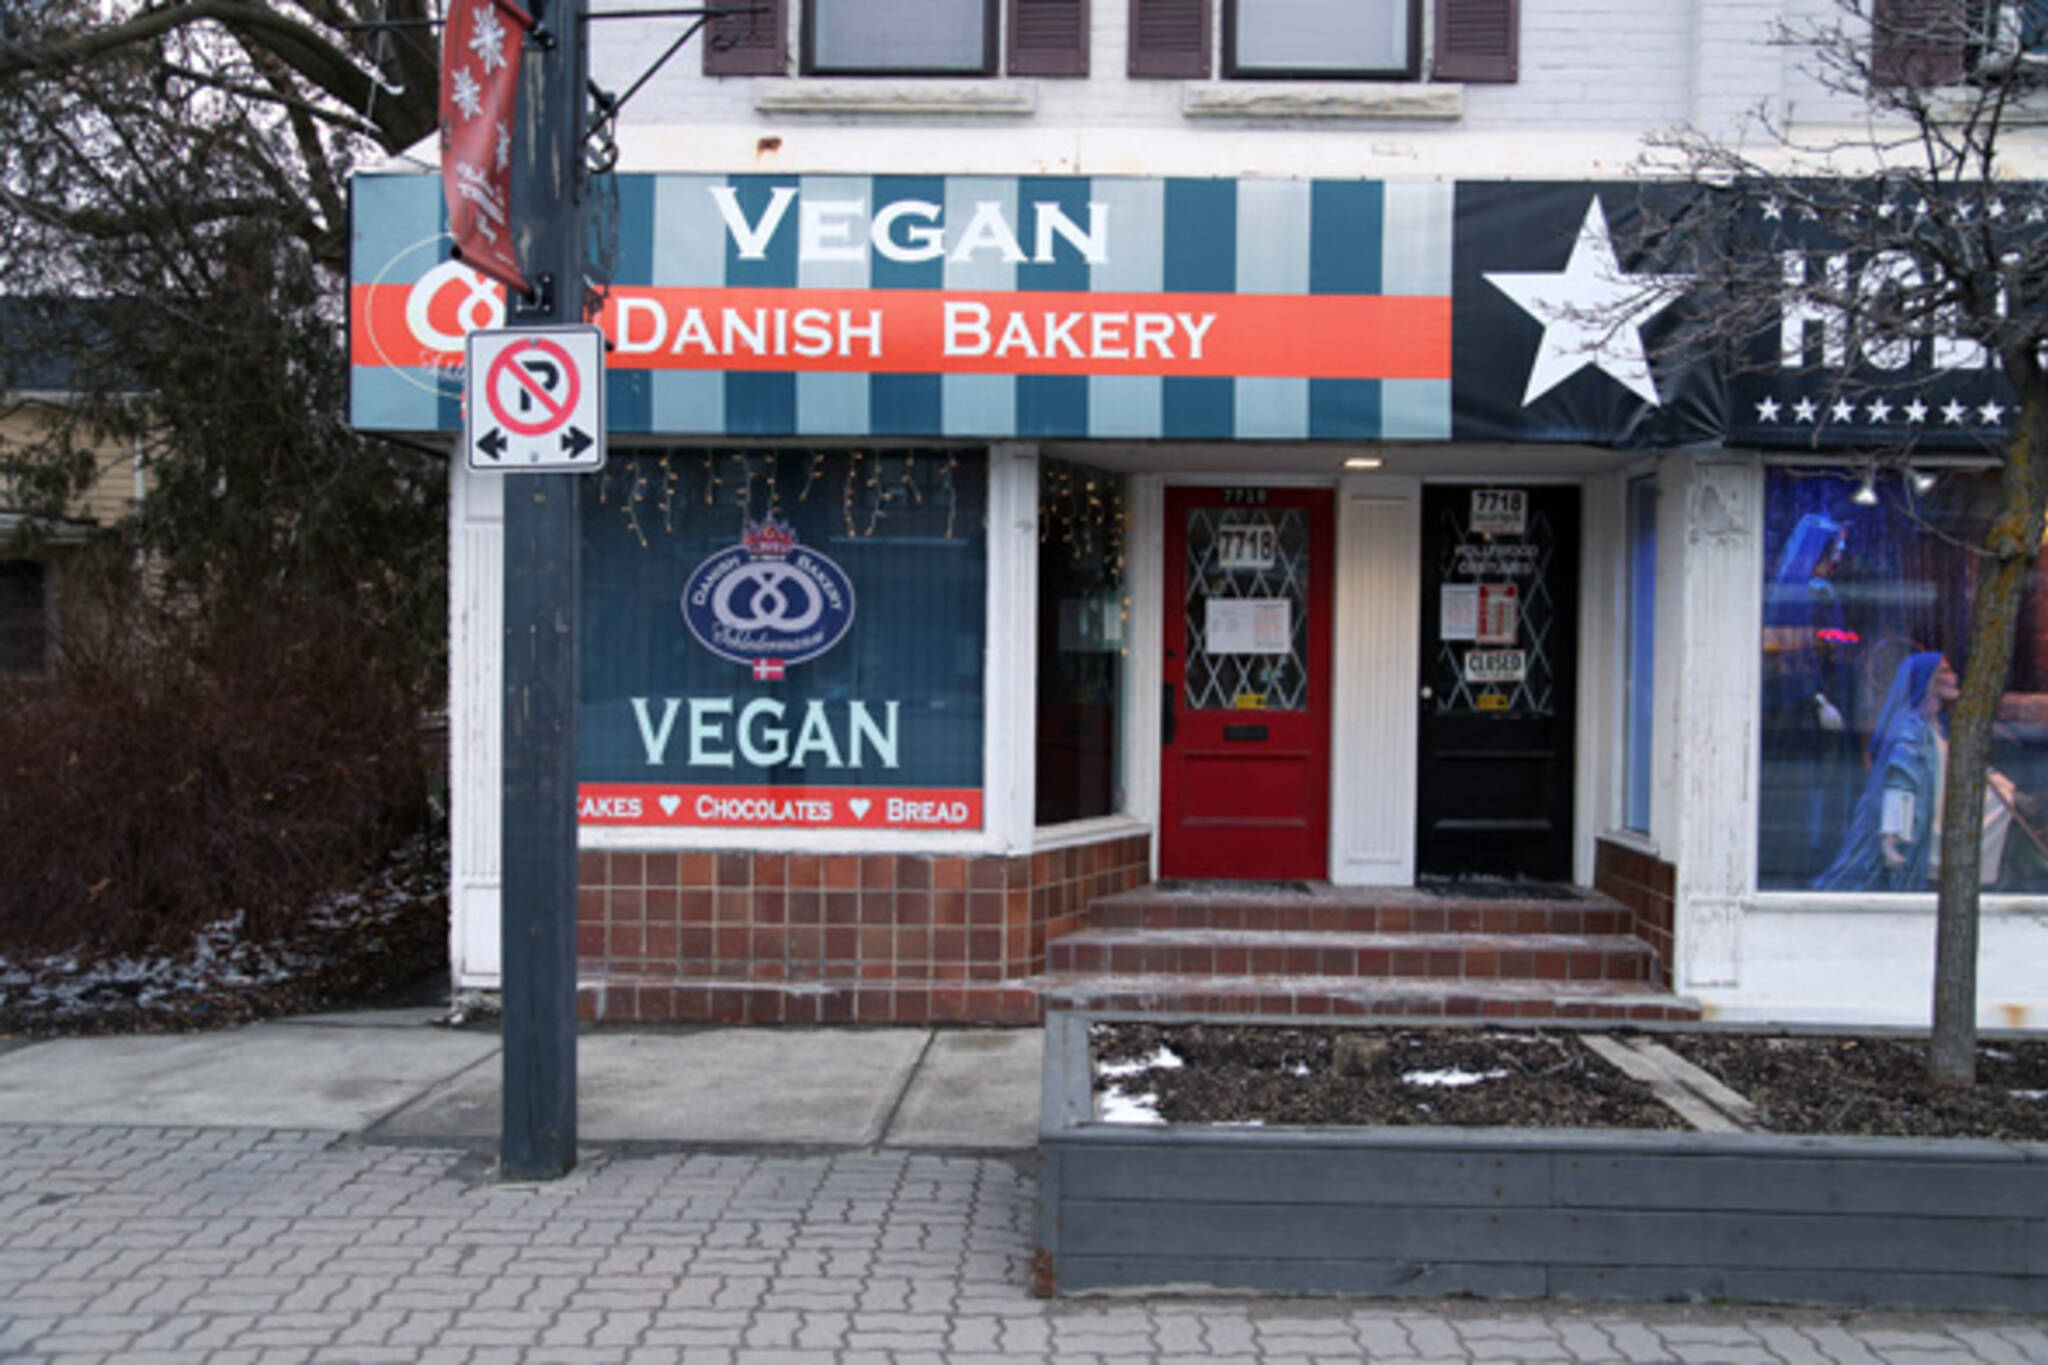 Vegan Danish Bakery